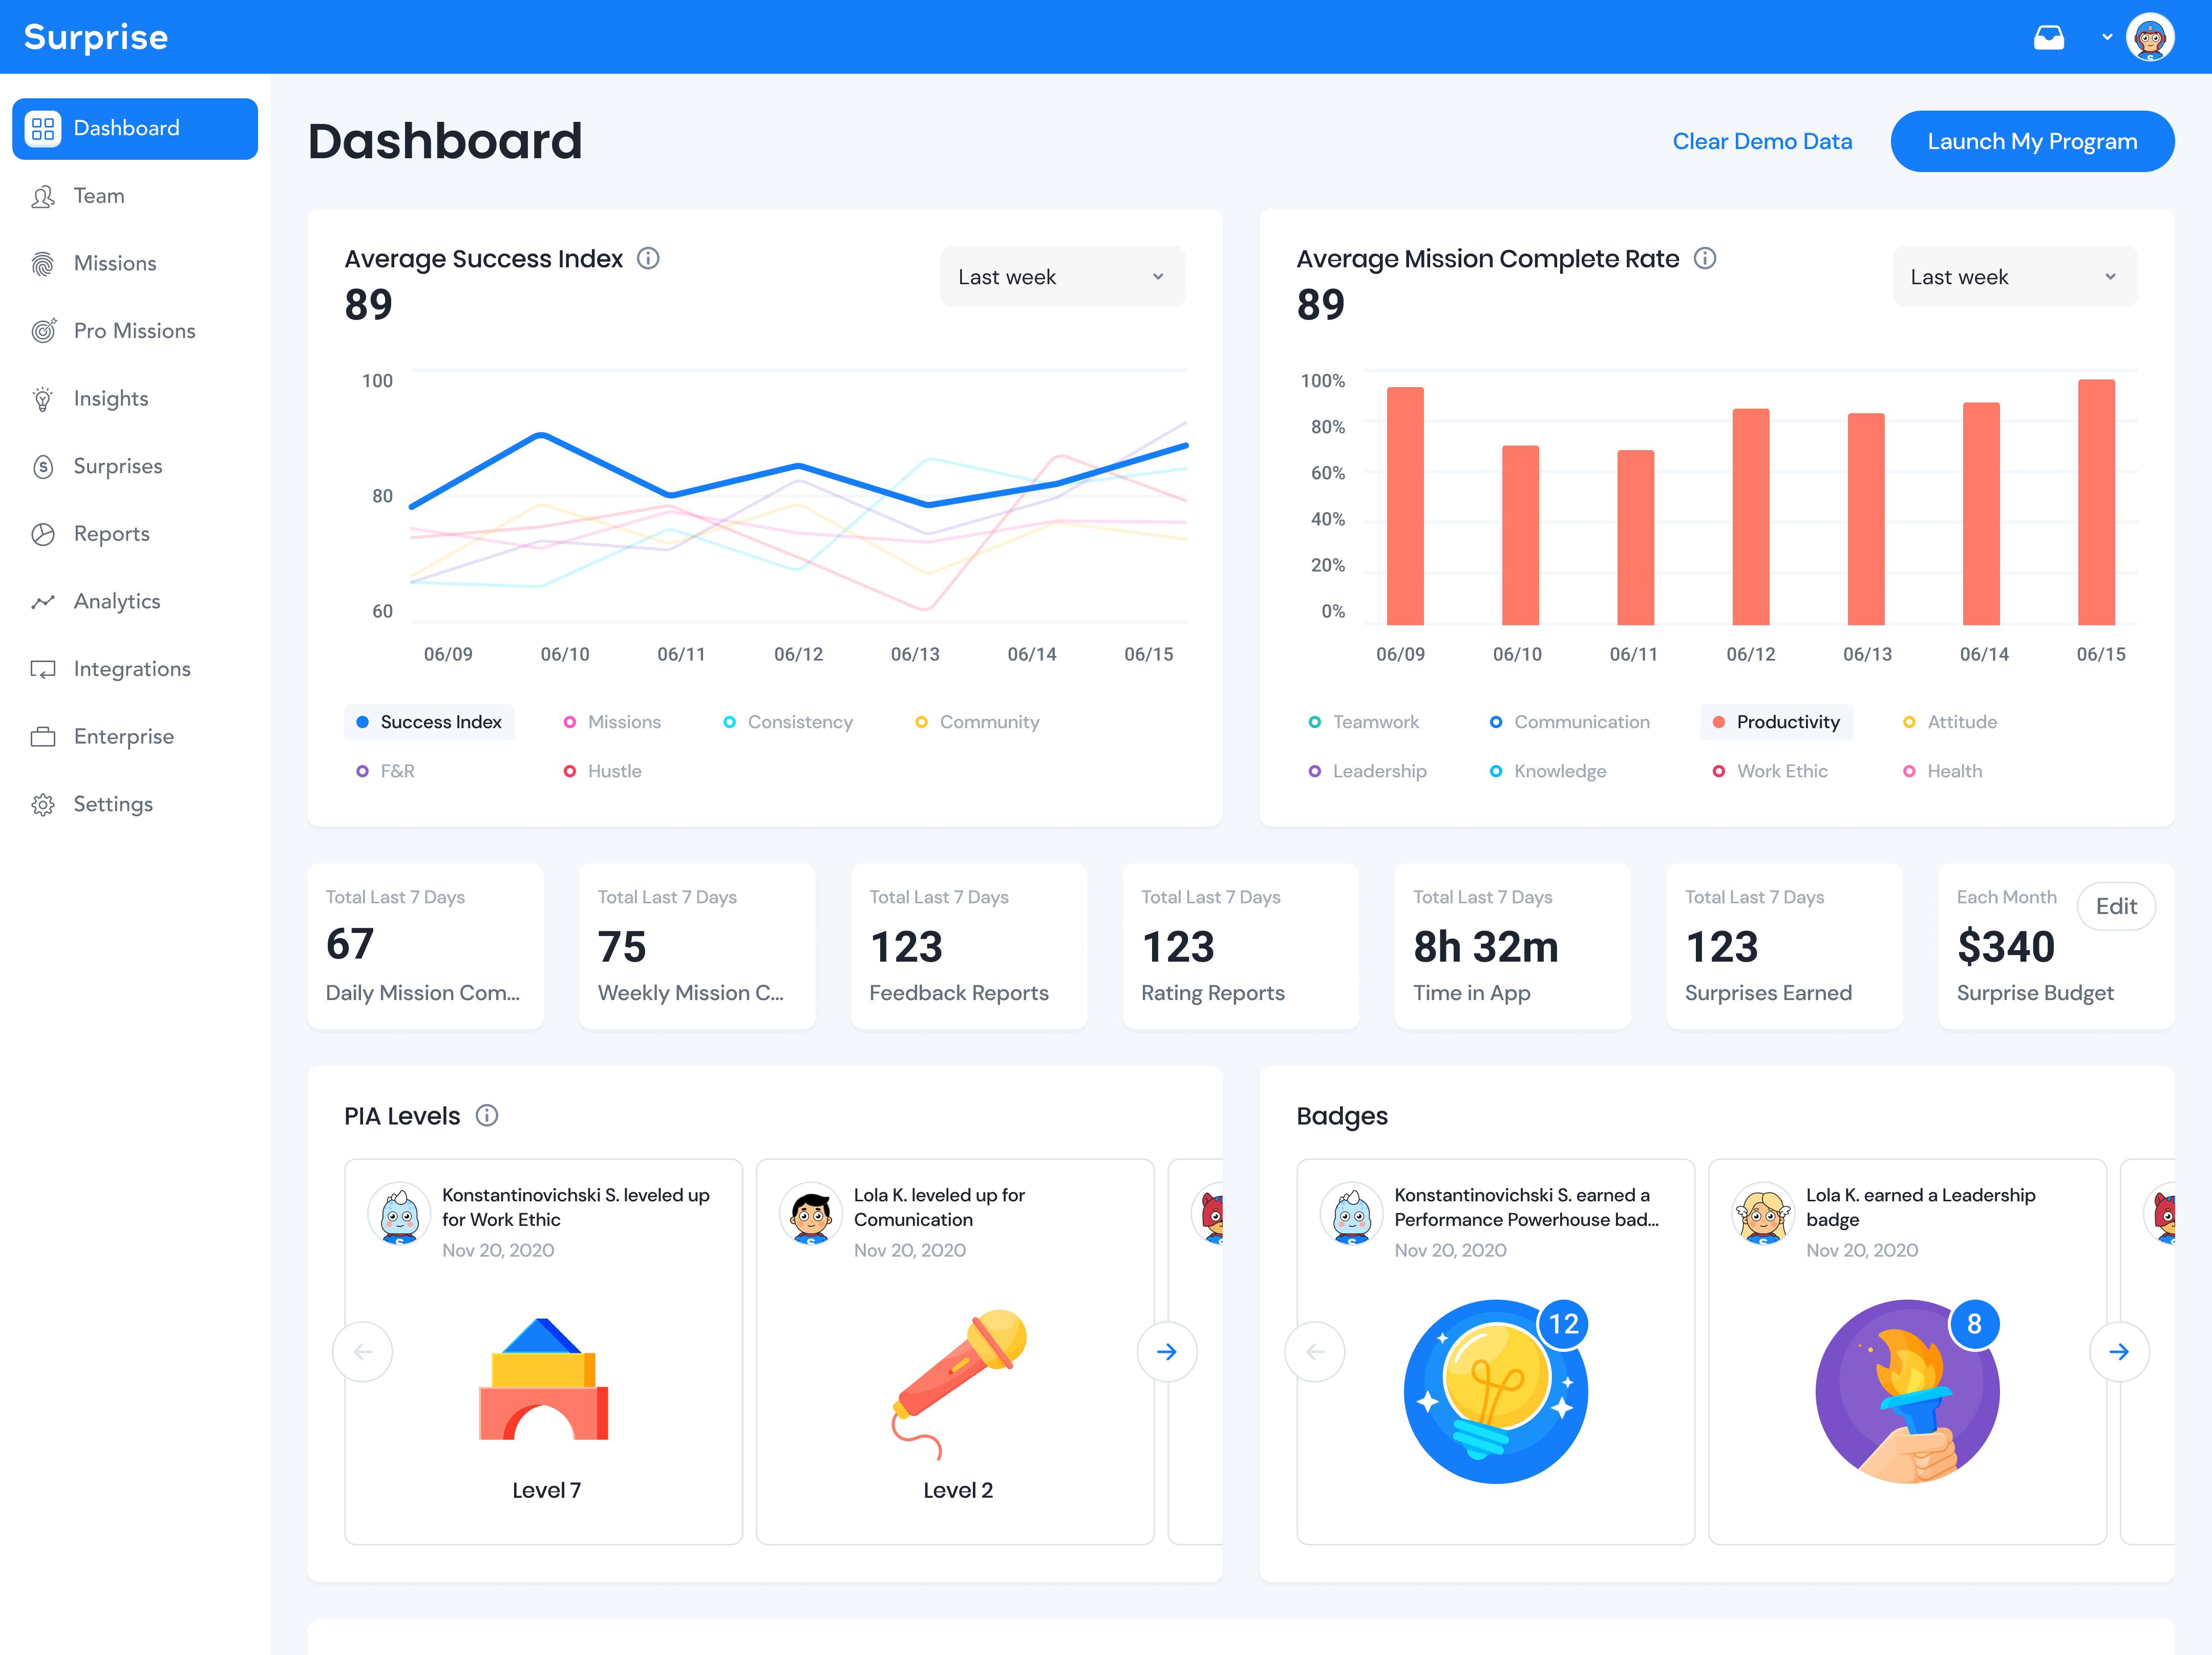 dashboard page